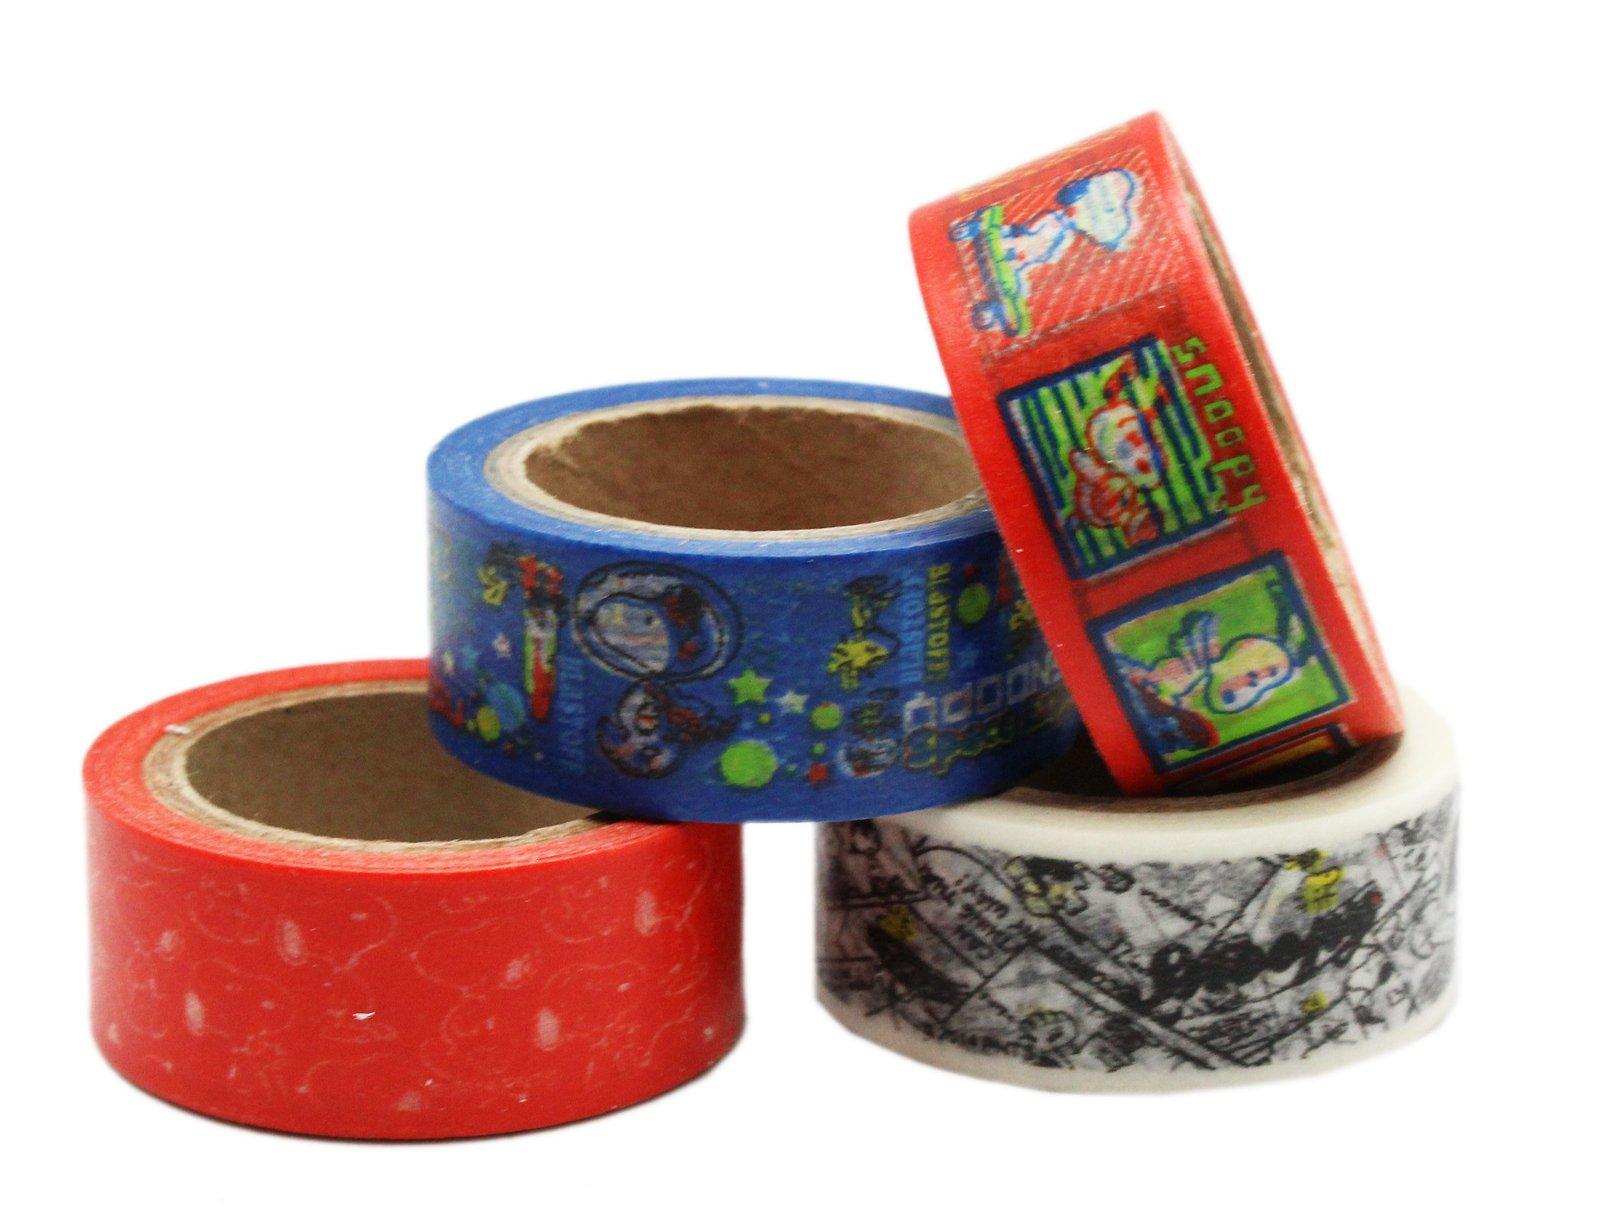 Peanuts Snoopy Variety Decorative Tape (4 rolls)